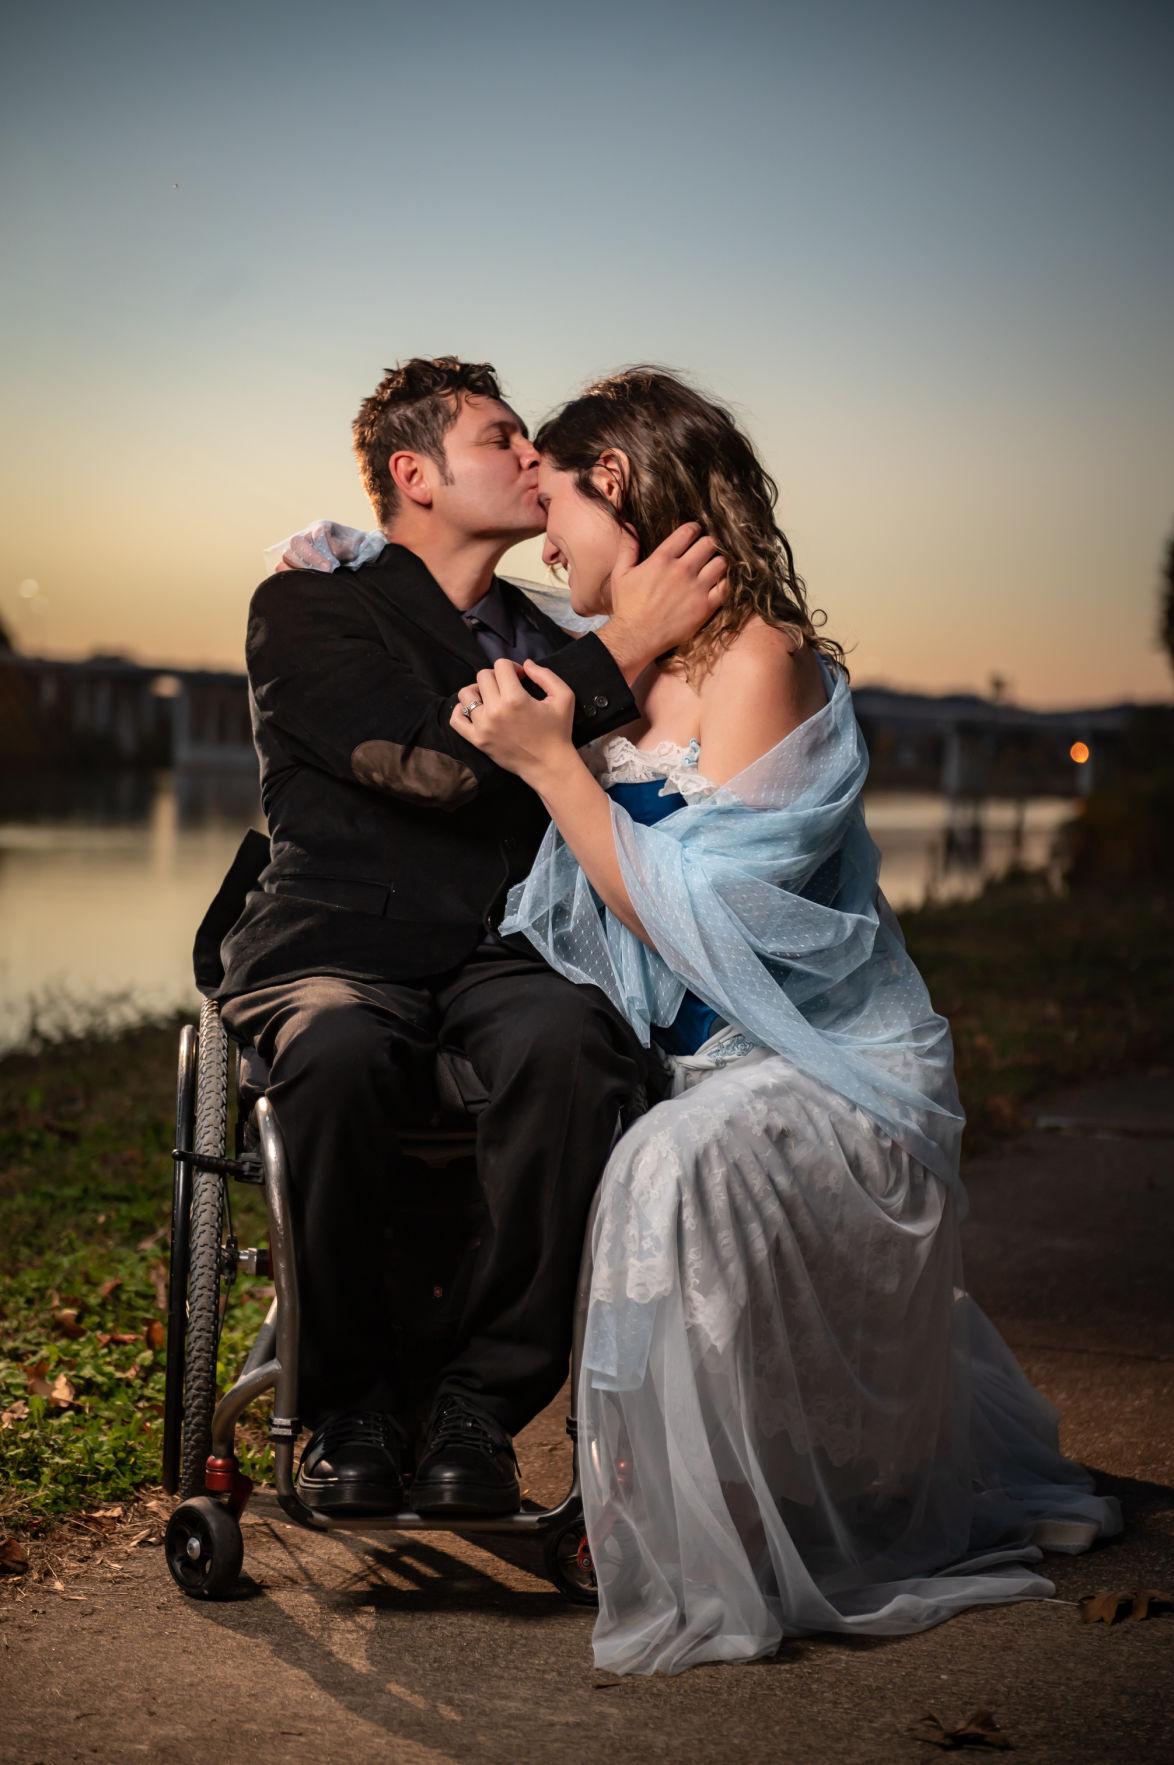 20210214-gm-wedding (5 of 10) 2.jpg